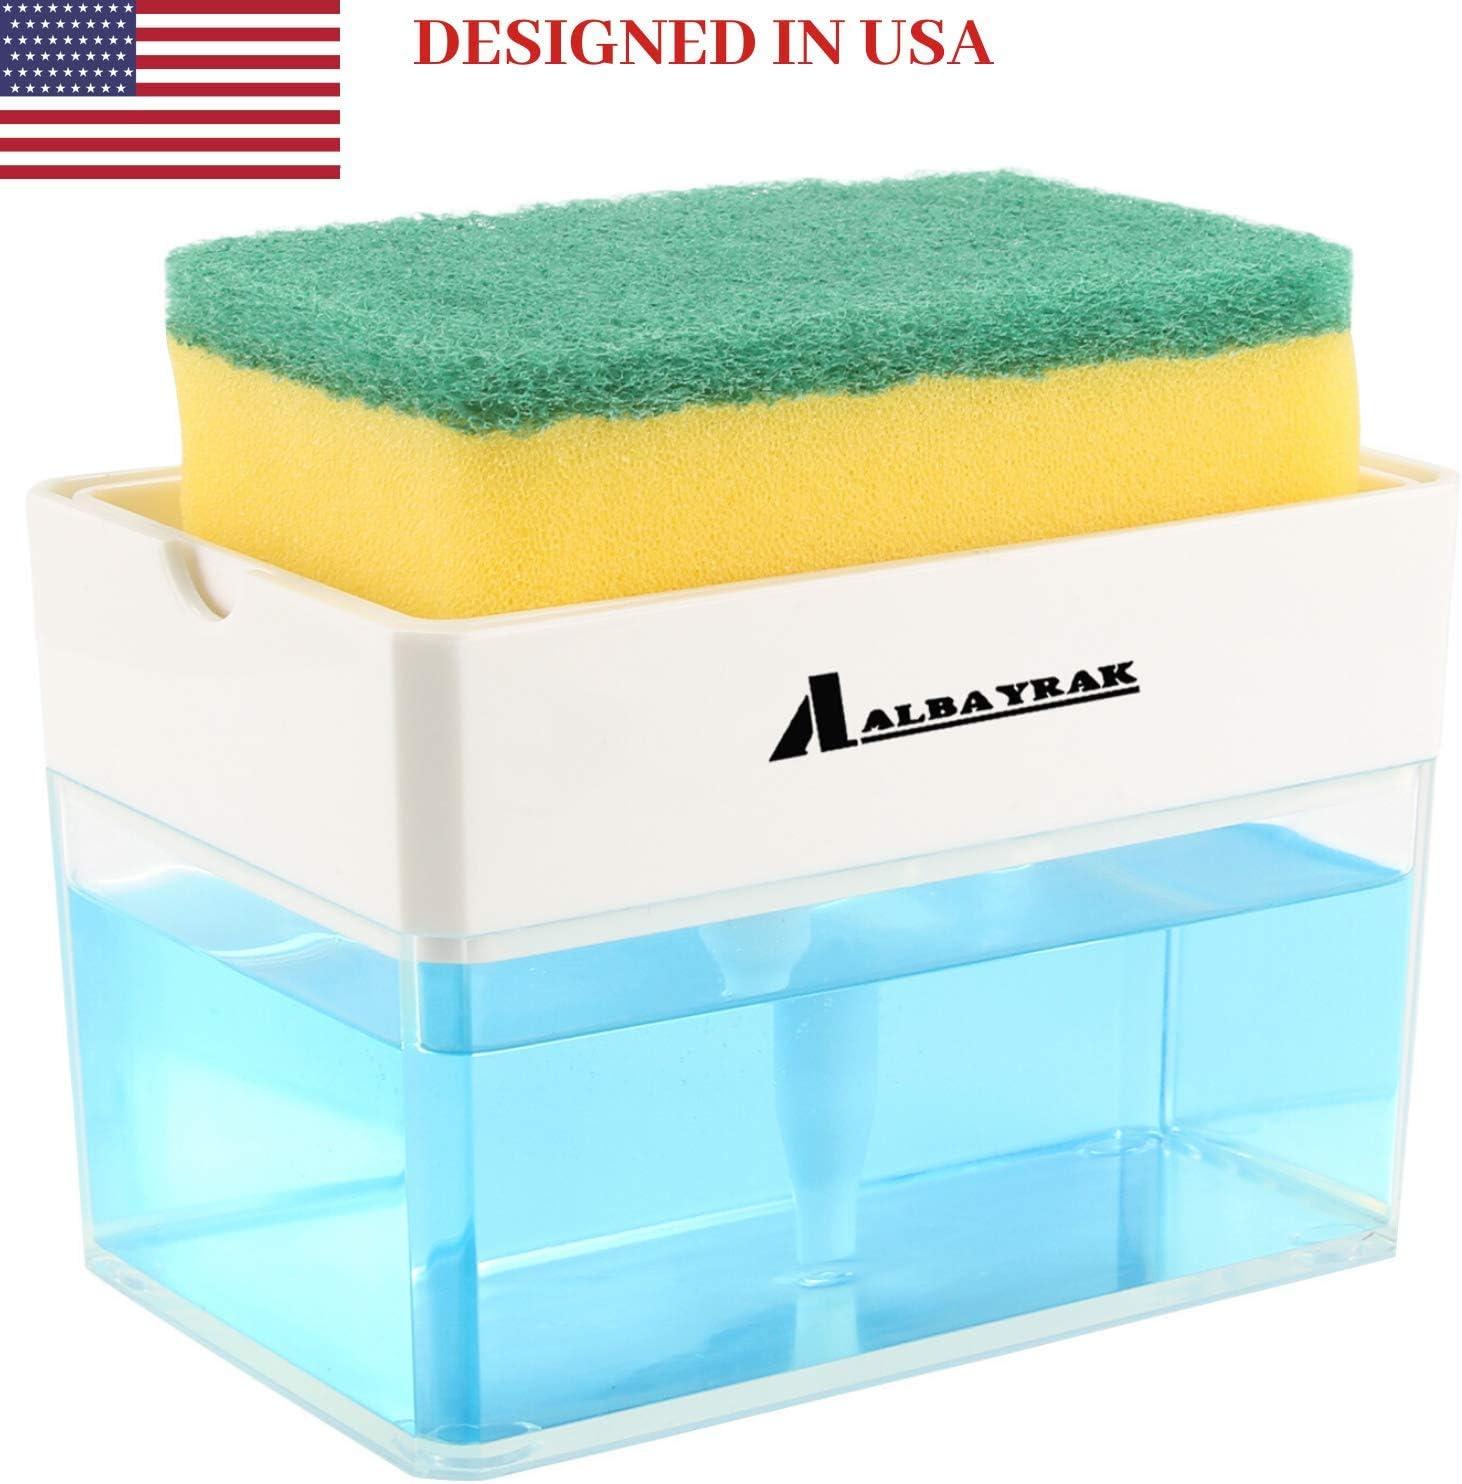 Albayrak Soap Dispenser for Kitchen + Sponge Holder 2-in-1 – Innovative Designed - Premium Quality Dish Soap Dispenser - Countertop Sink Dispenser – Instant Refill – Durable & Rust proof - 13 oz